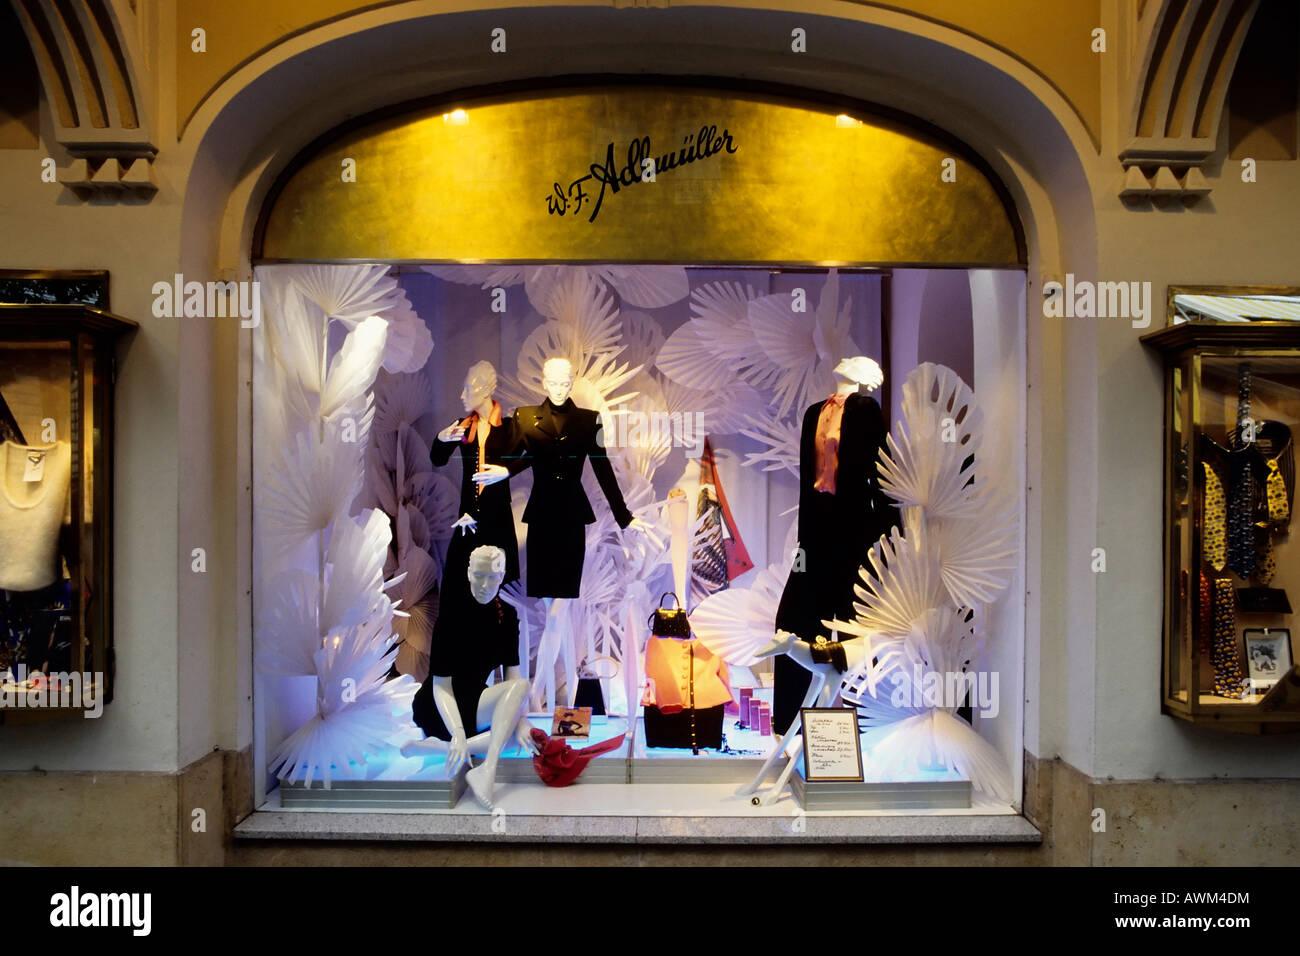 Vitrine, Adlmueller couture boutique, Kaertnerstrasse St., Vienne, Autriche, Europe Photo Stock